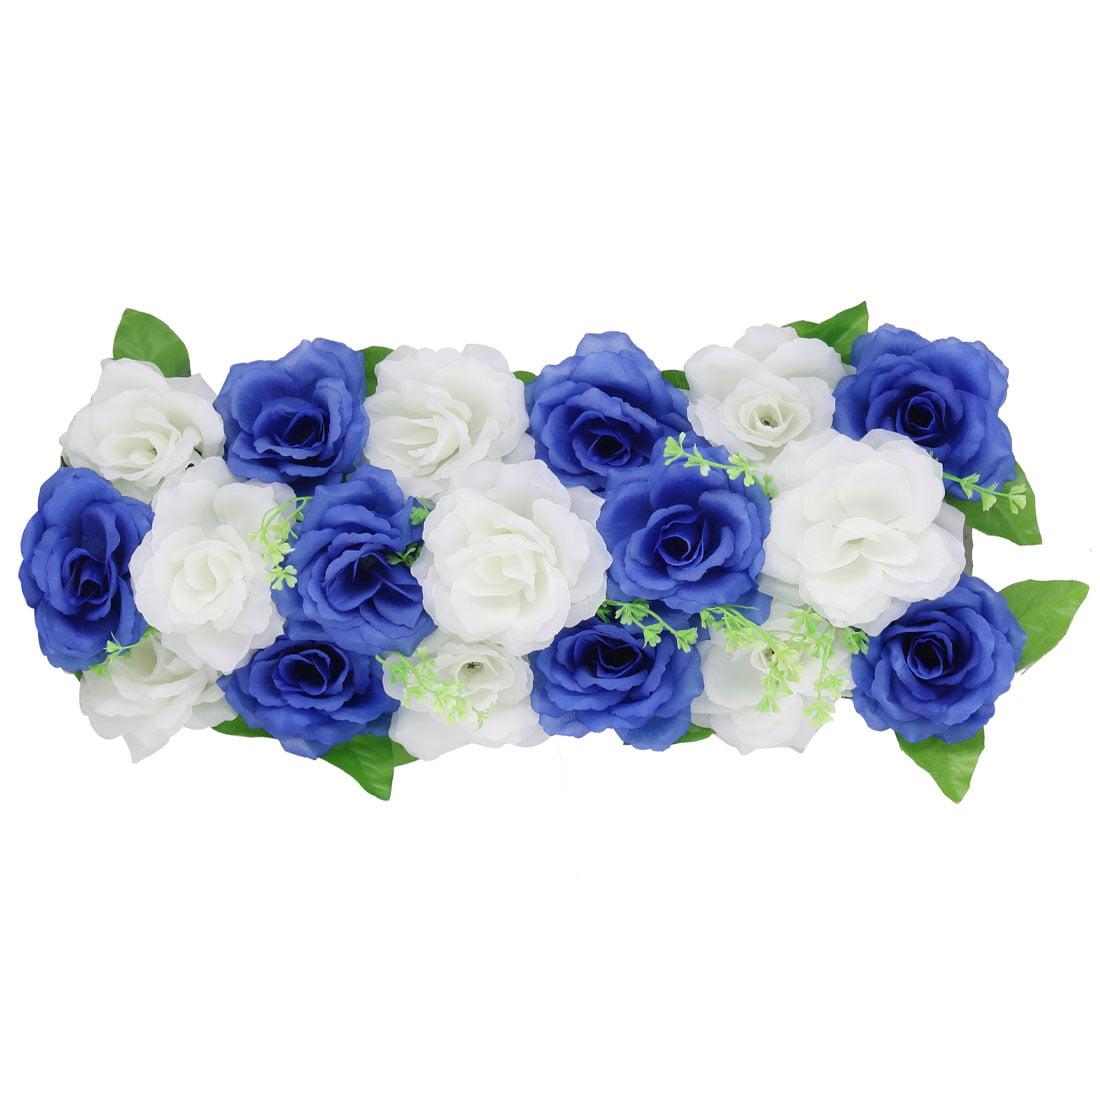 Unique Bargains Wedding Fabric DIY Wall Arch Hanging Artificial Flower Decor Royal Blue White